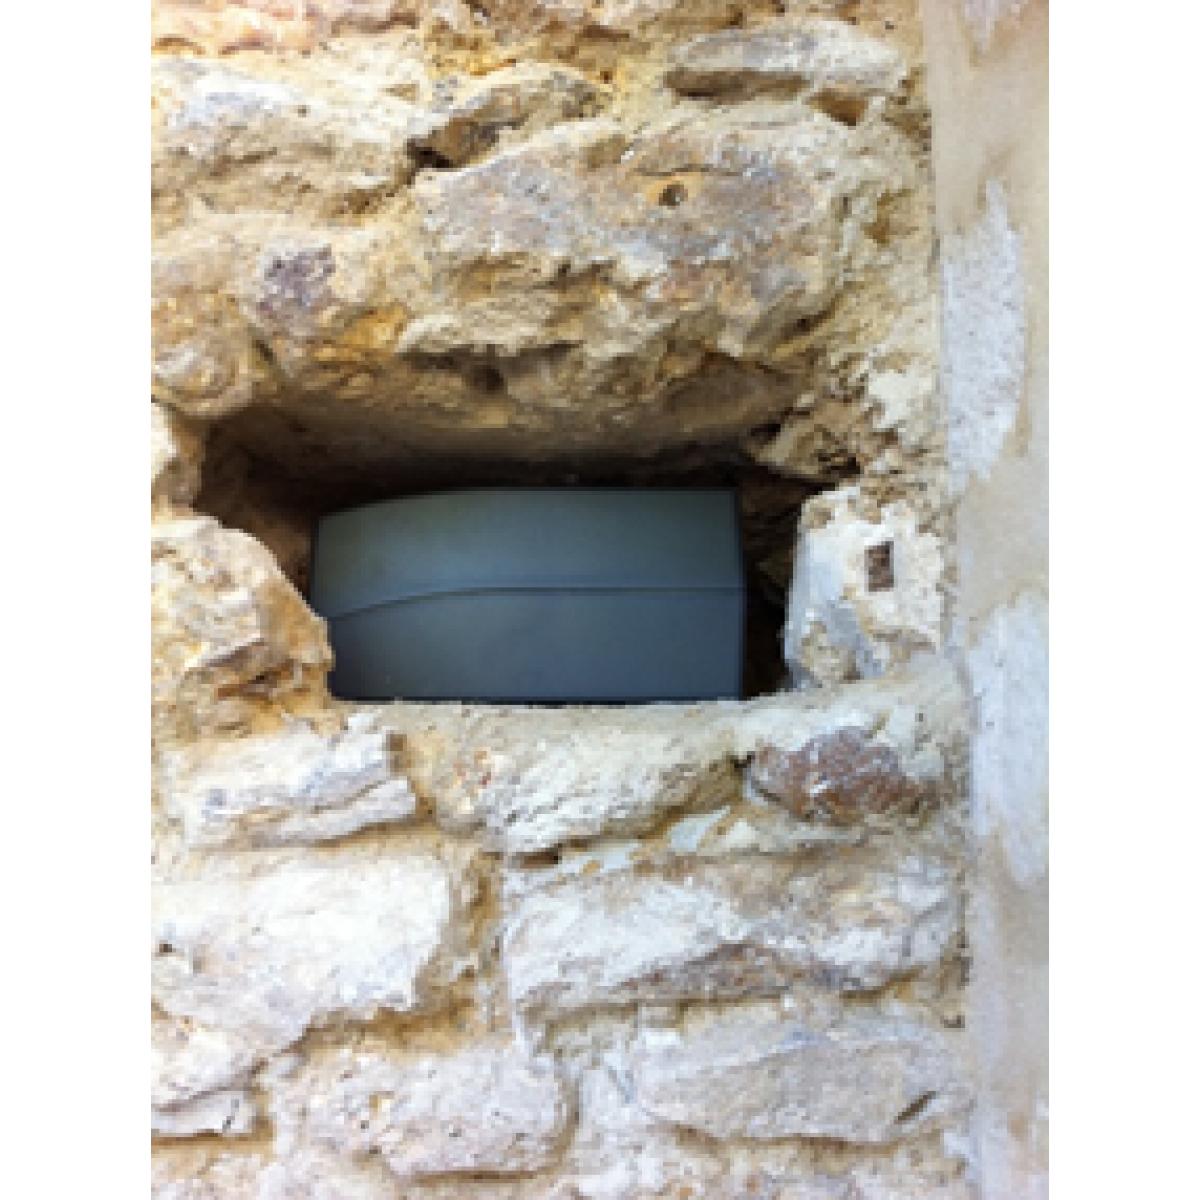 Mur tronic 2 ass chement durable traitement de l - Assecheur de mur ...